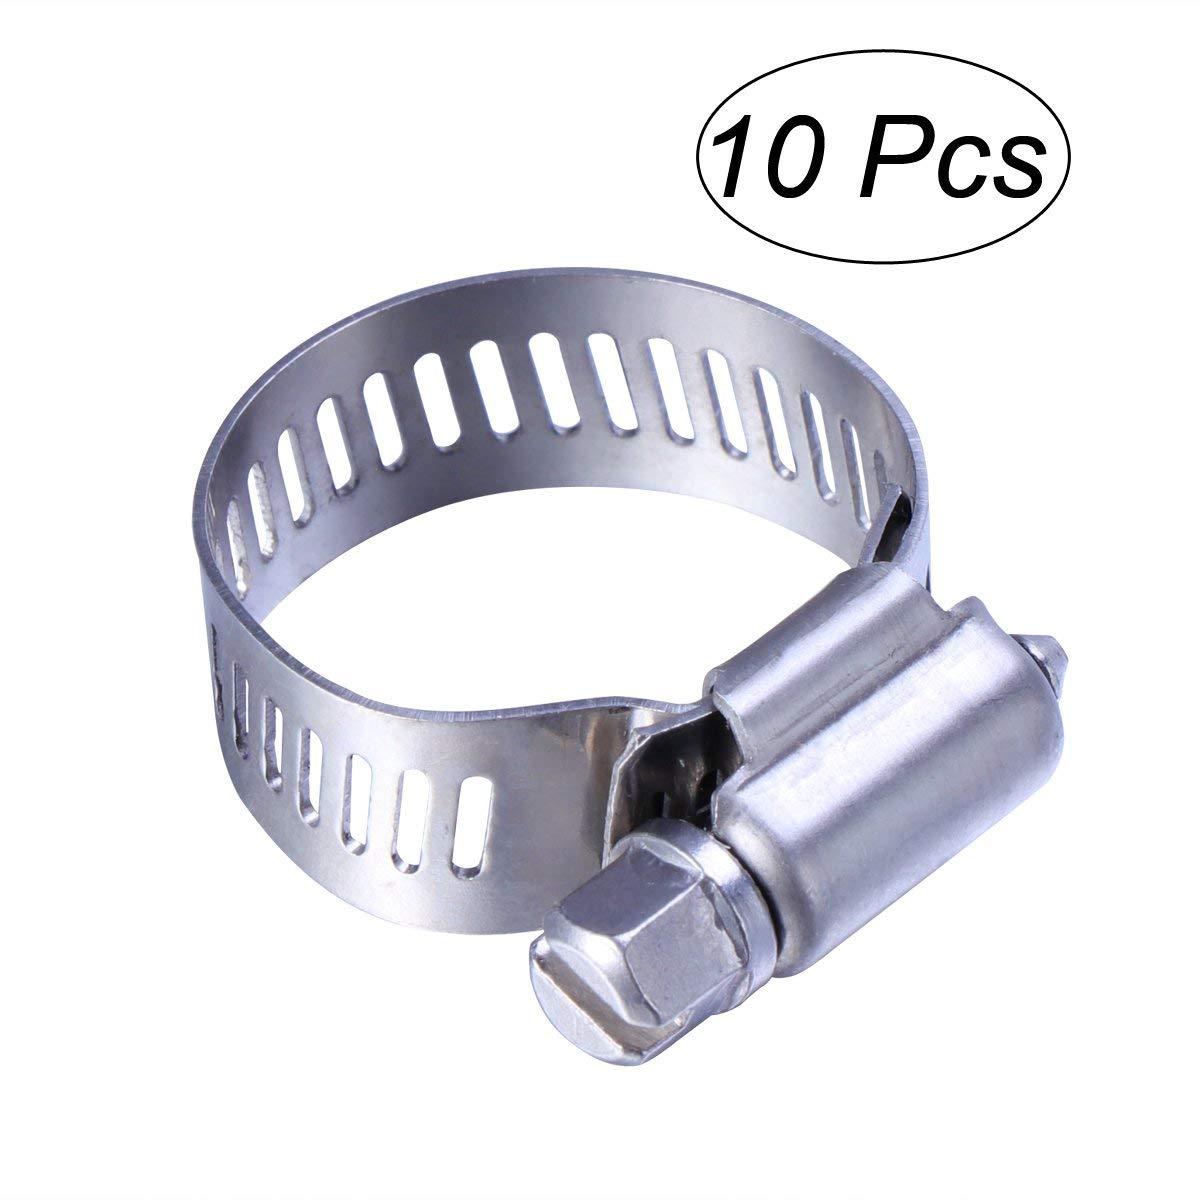 UEETEK 10 Pack Heavy Duty Adjustable Stainless Steel Worm Gear Hose Clamps Miniature Power-Seal Worm-Drive Kit 14mm-27mm